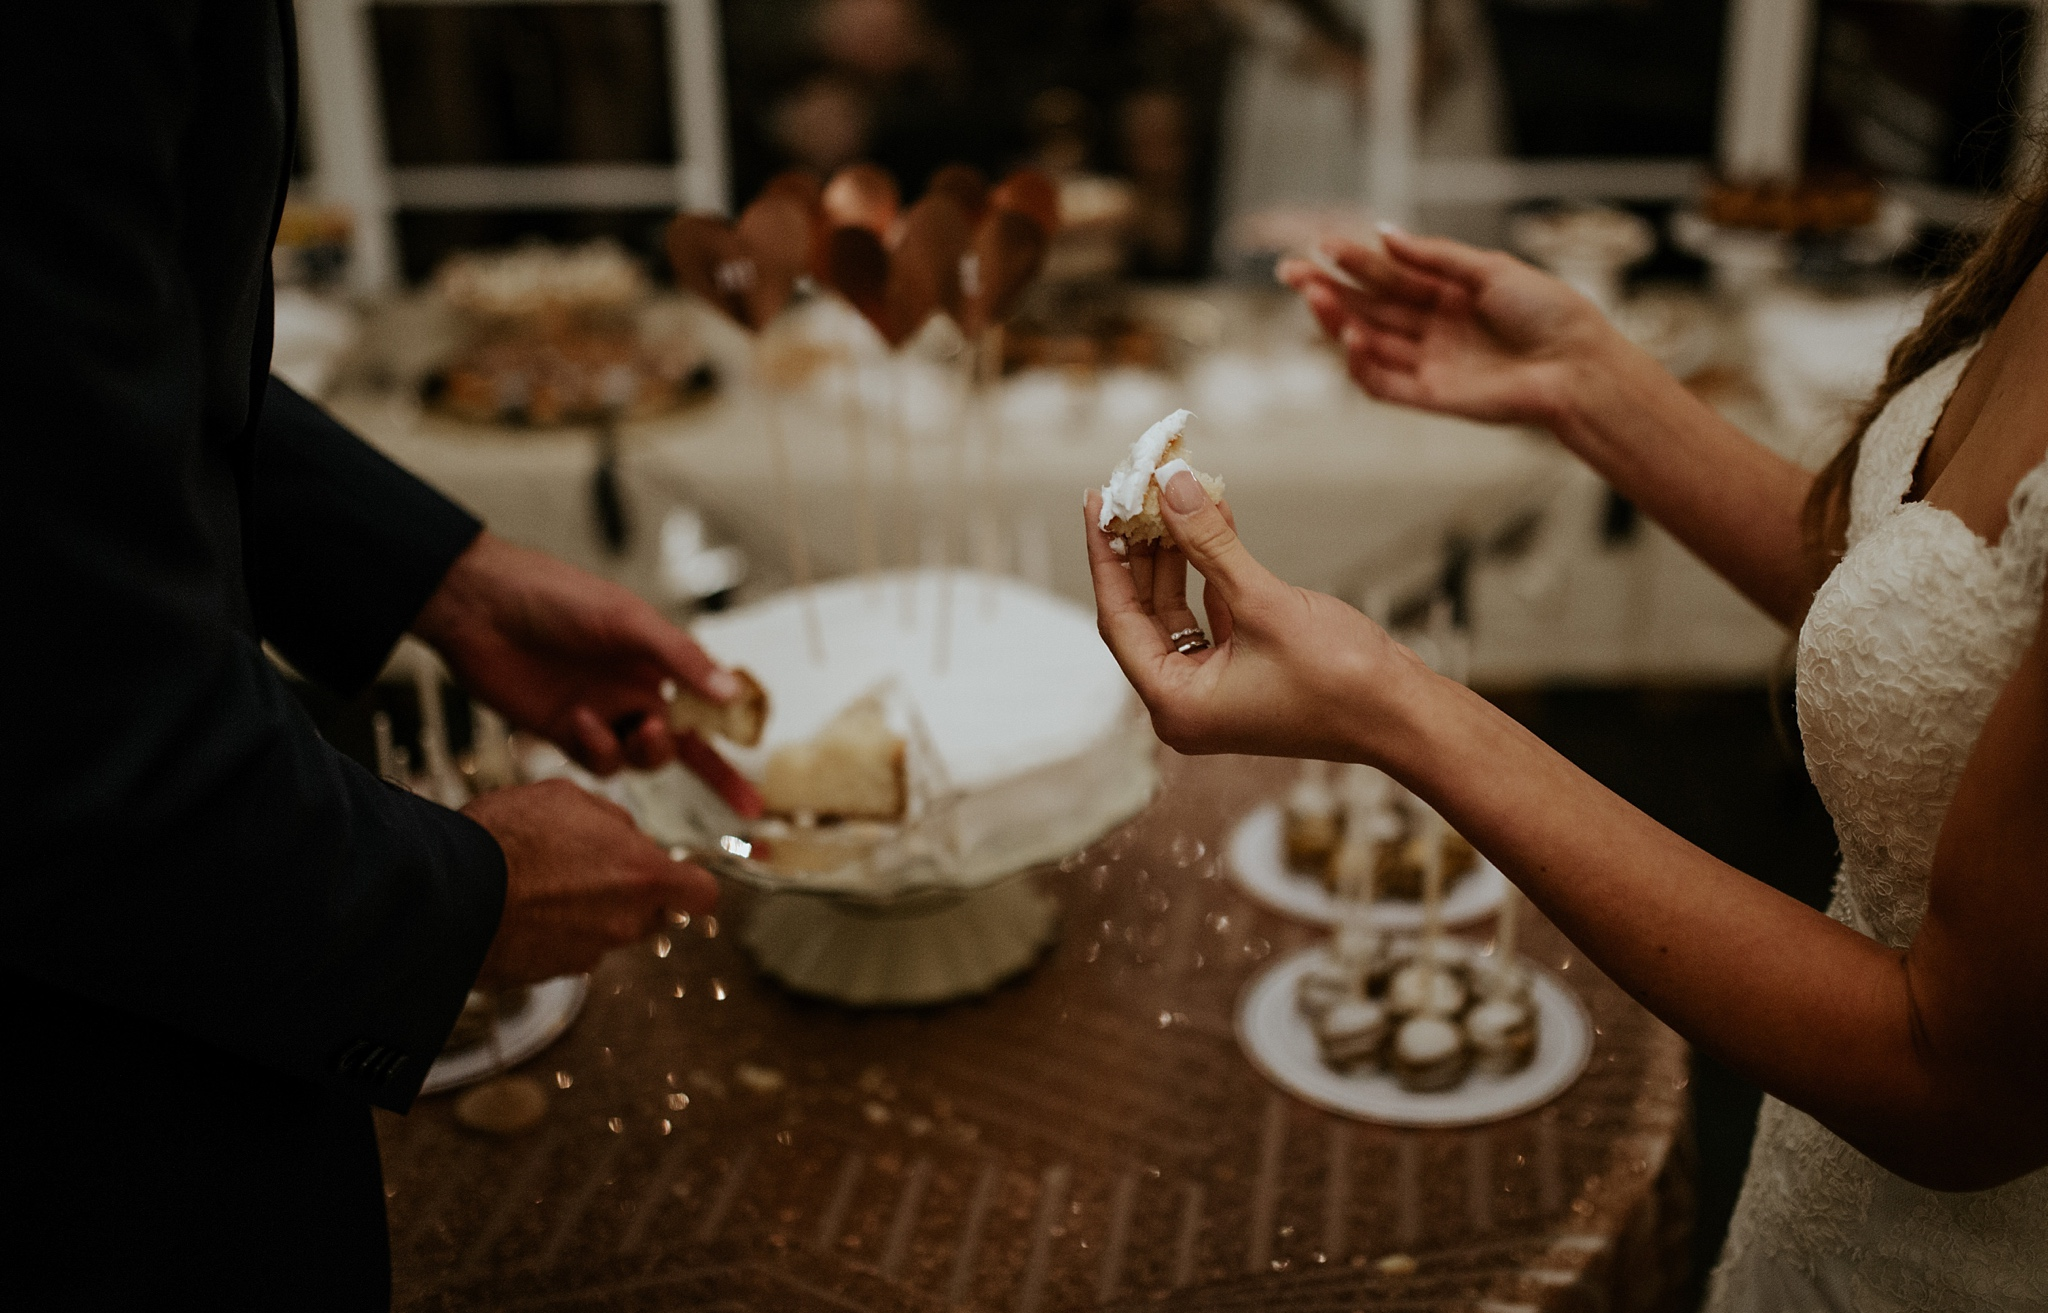 Bohemian Orcutt Ranch Wedding in Los Angeles California  - Los Angeles Californai Wedding Photographer_0062.jpg